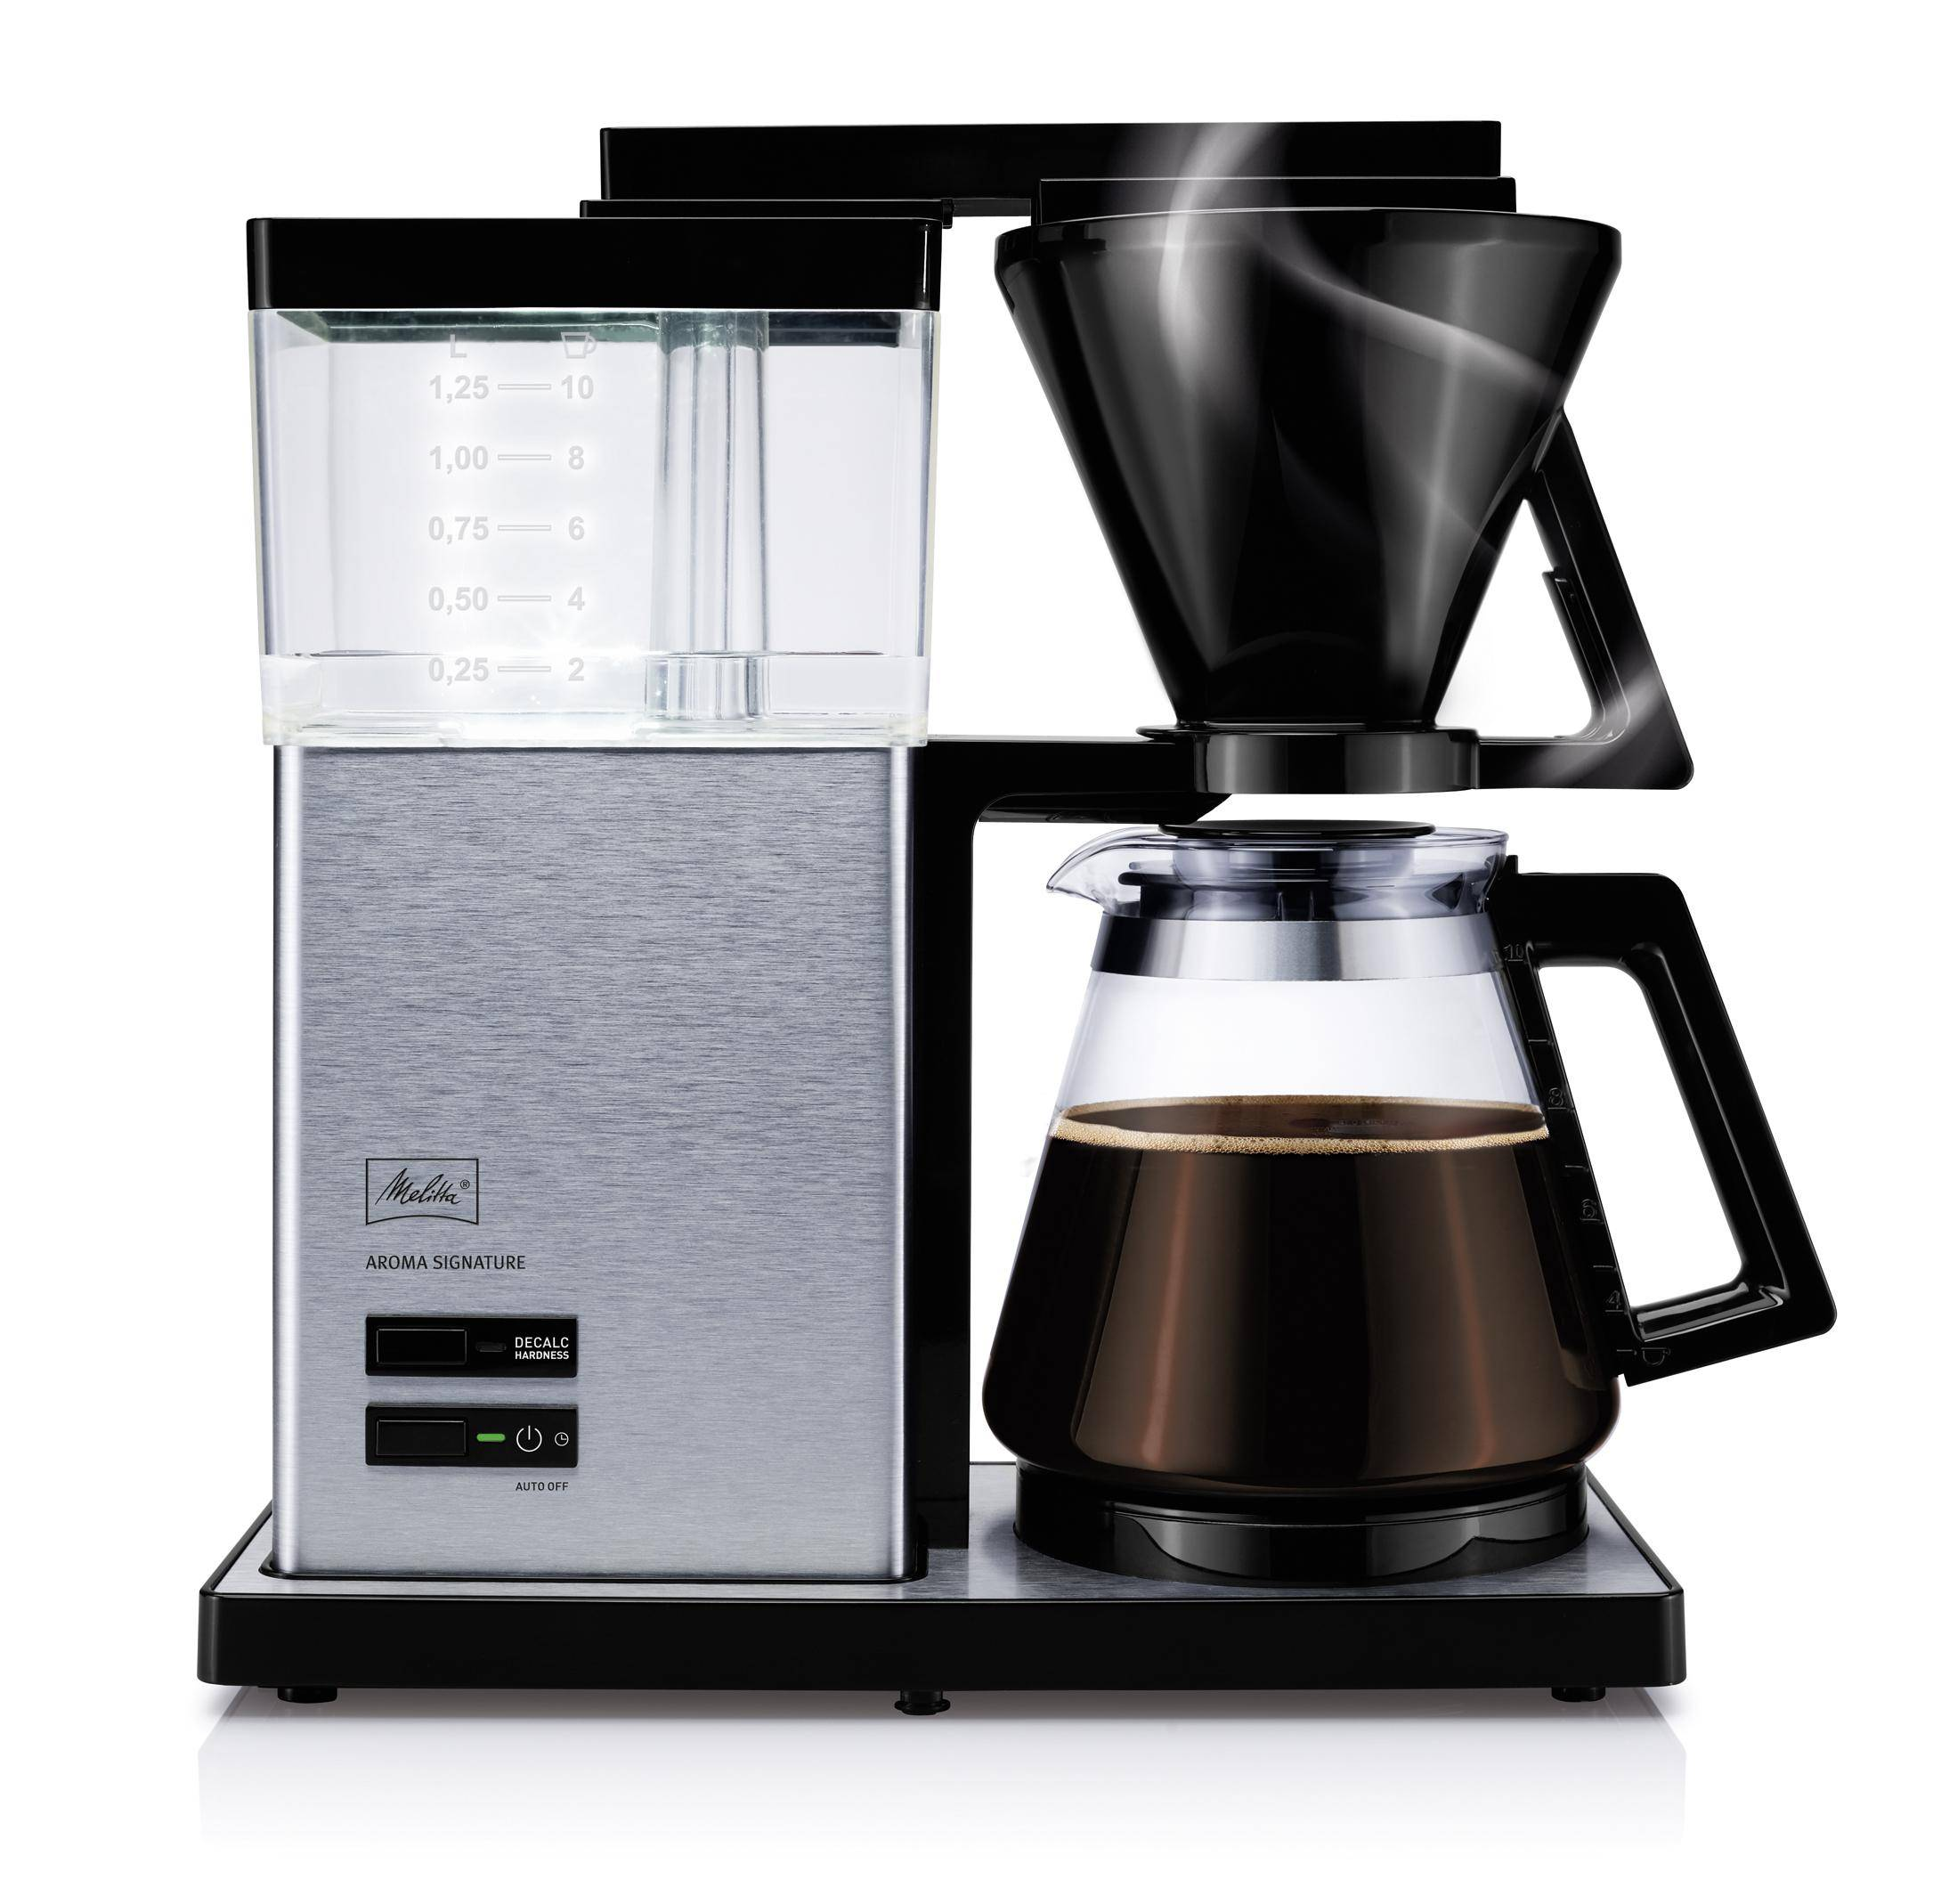 Melitta Kaffebryggare MELITTA Aroma Signature